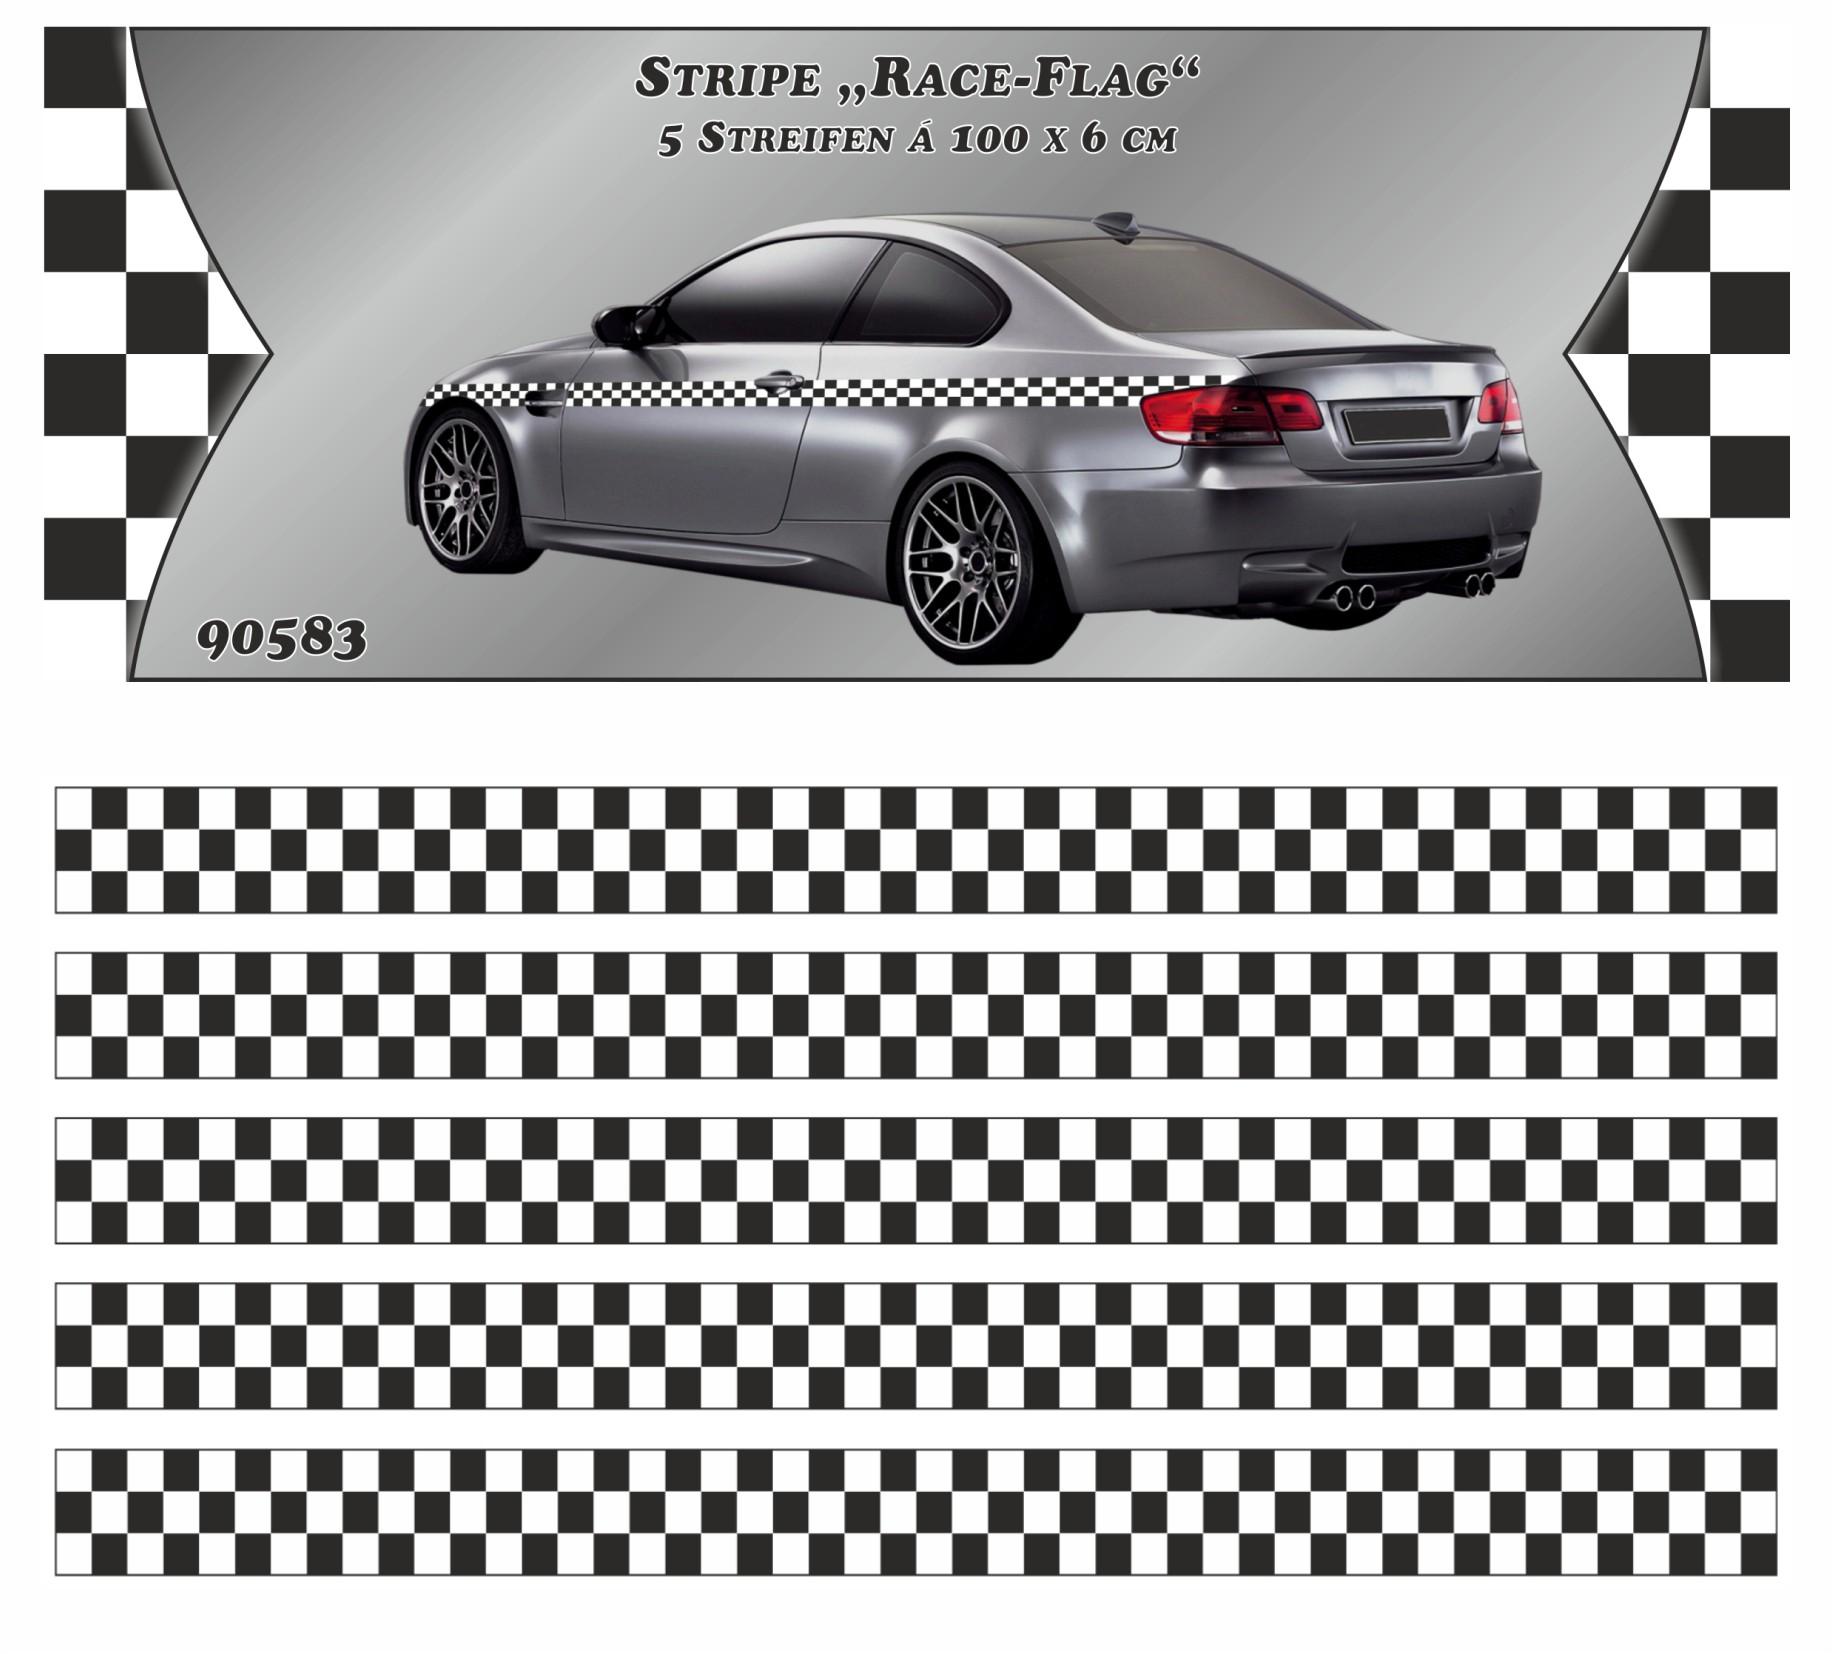 Sticker Race-Flag-Stripe 5 m x 60 mm Car-Styling Race-deco-stripes